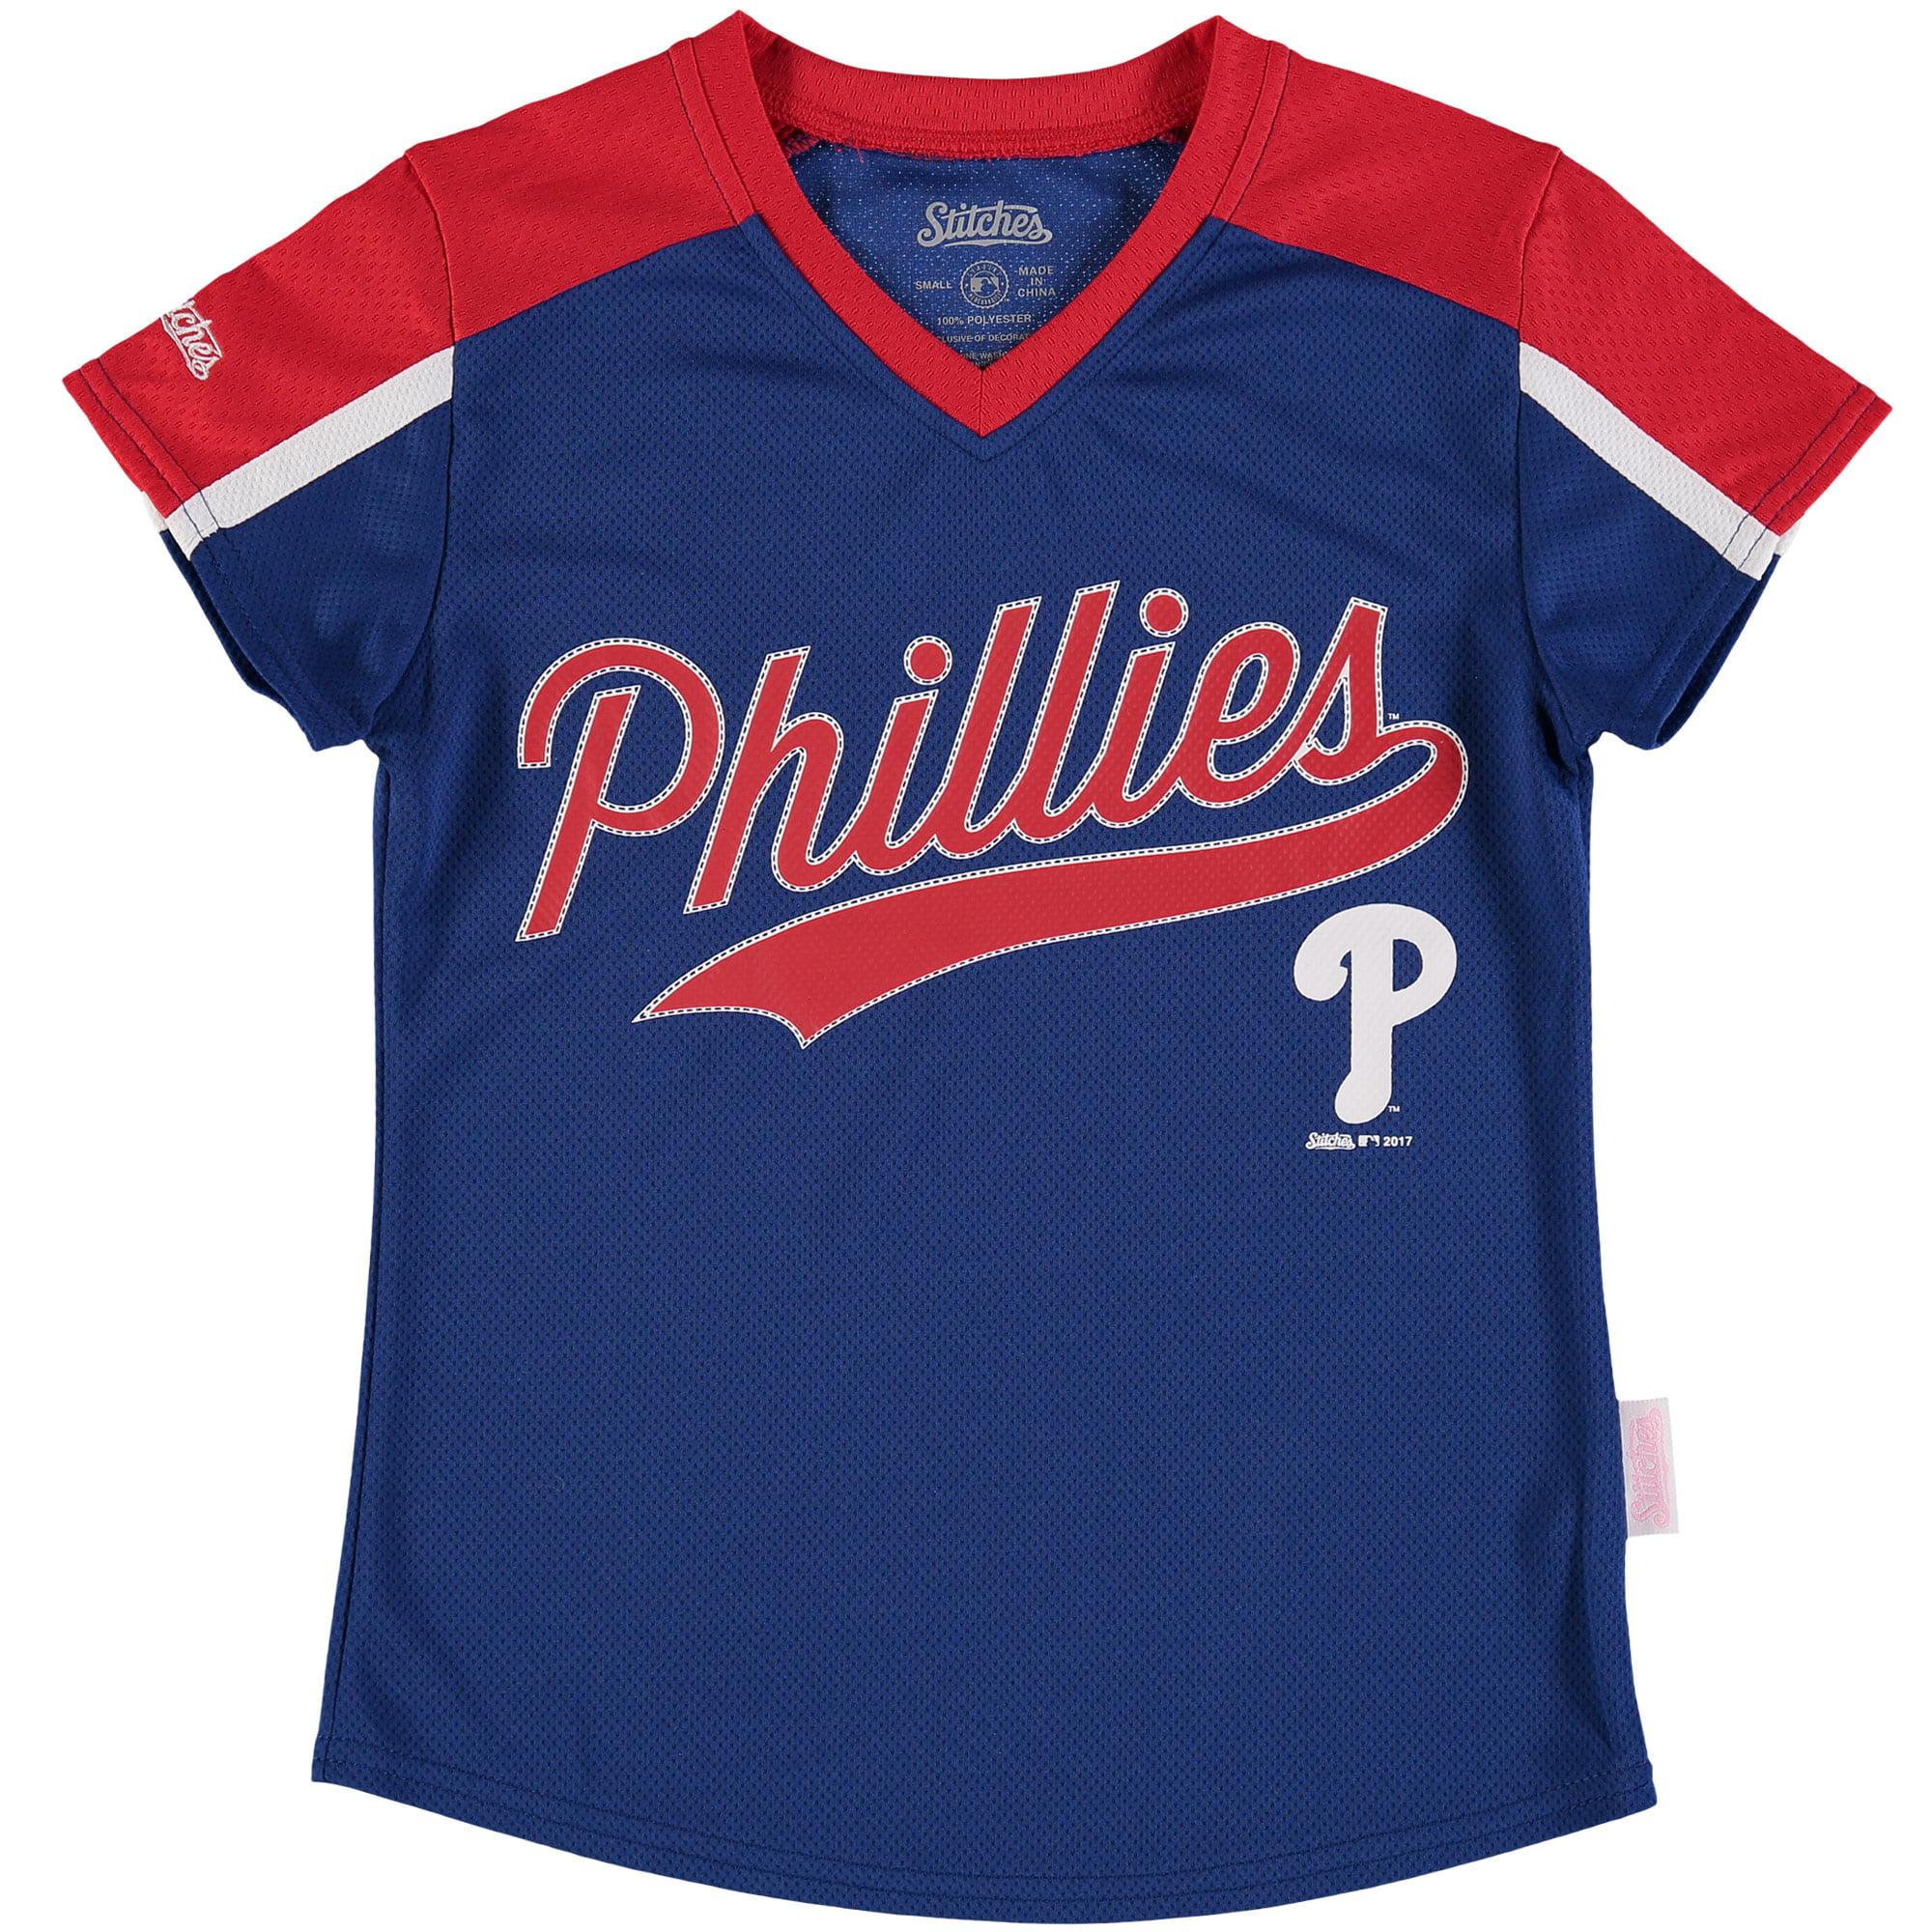 Girls Youth Stitches Royal/Red Philadelphia Phillies V-Neck Jersey T-Shirt